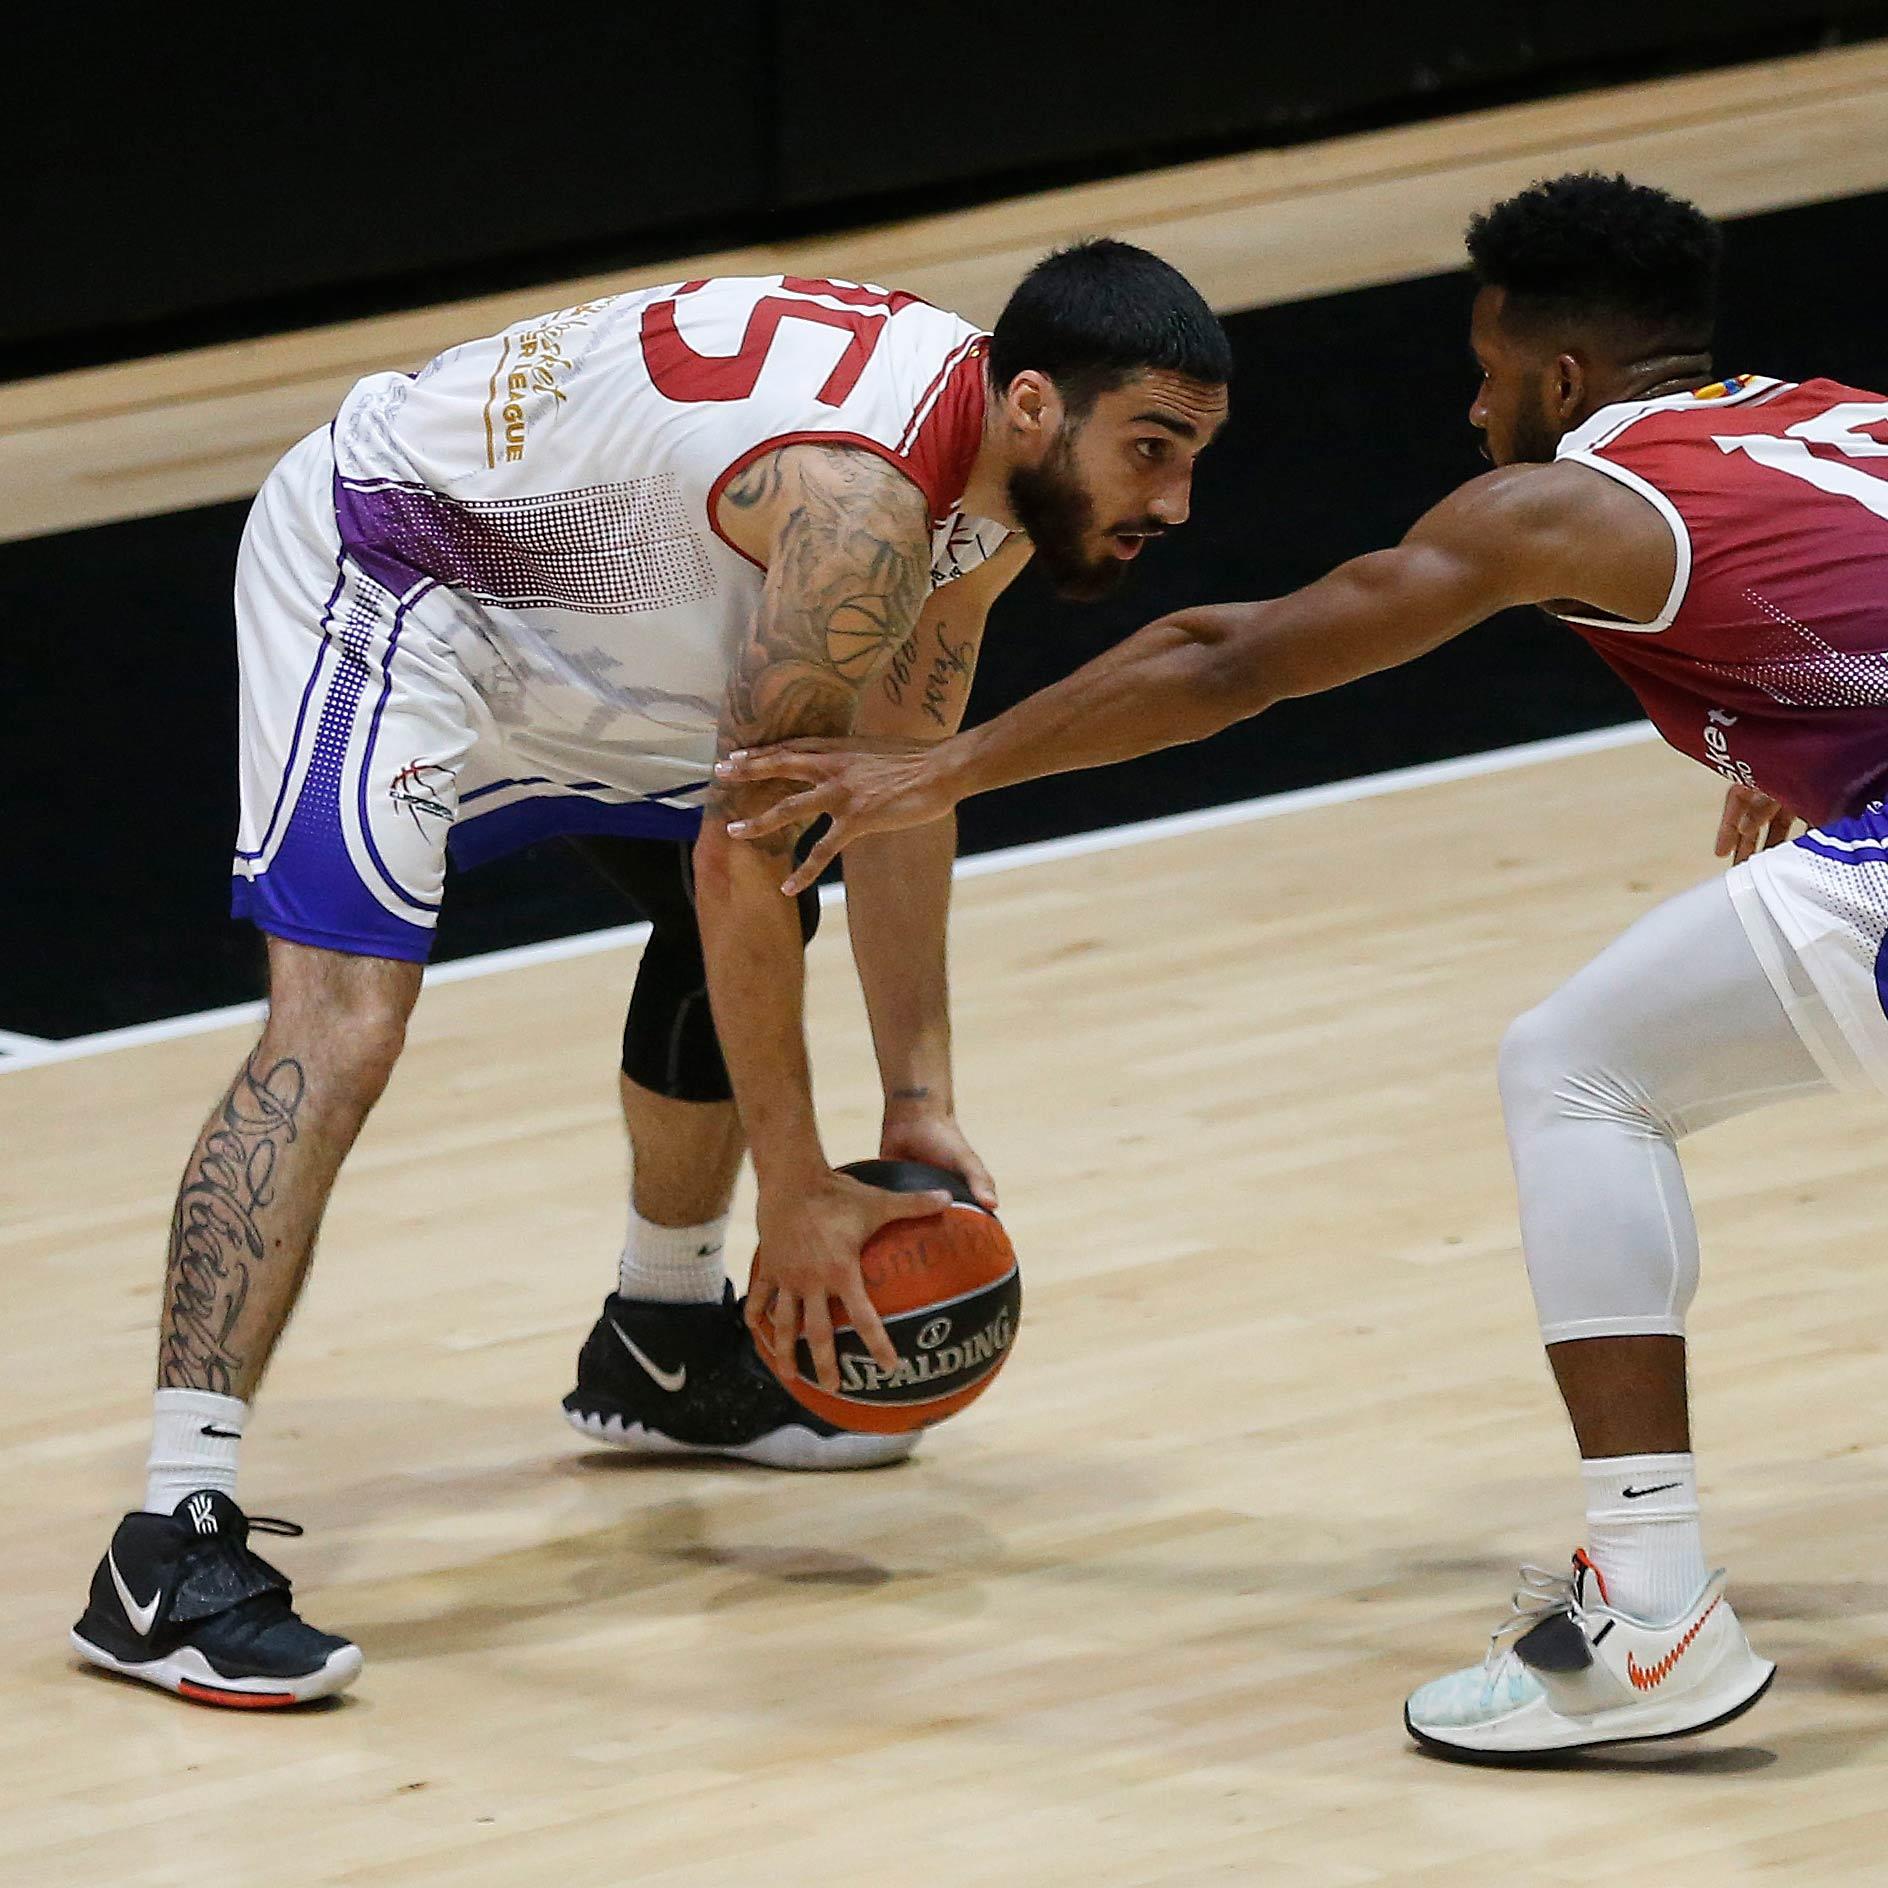 Basketball Jose Ramos